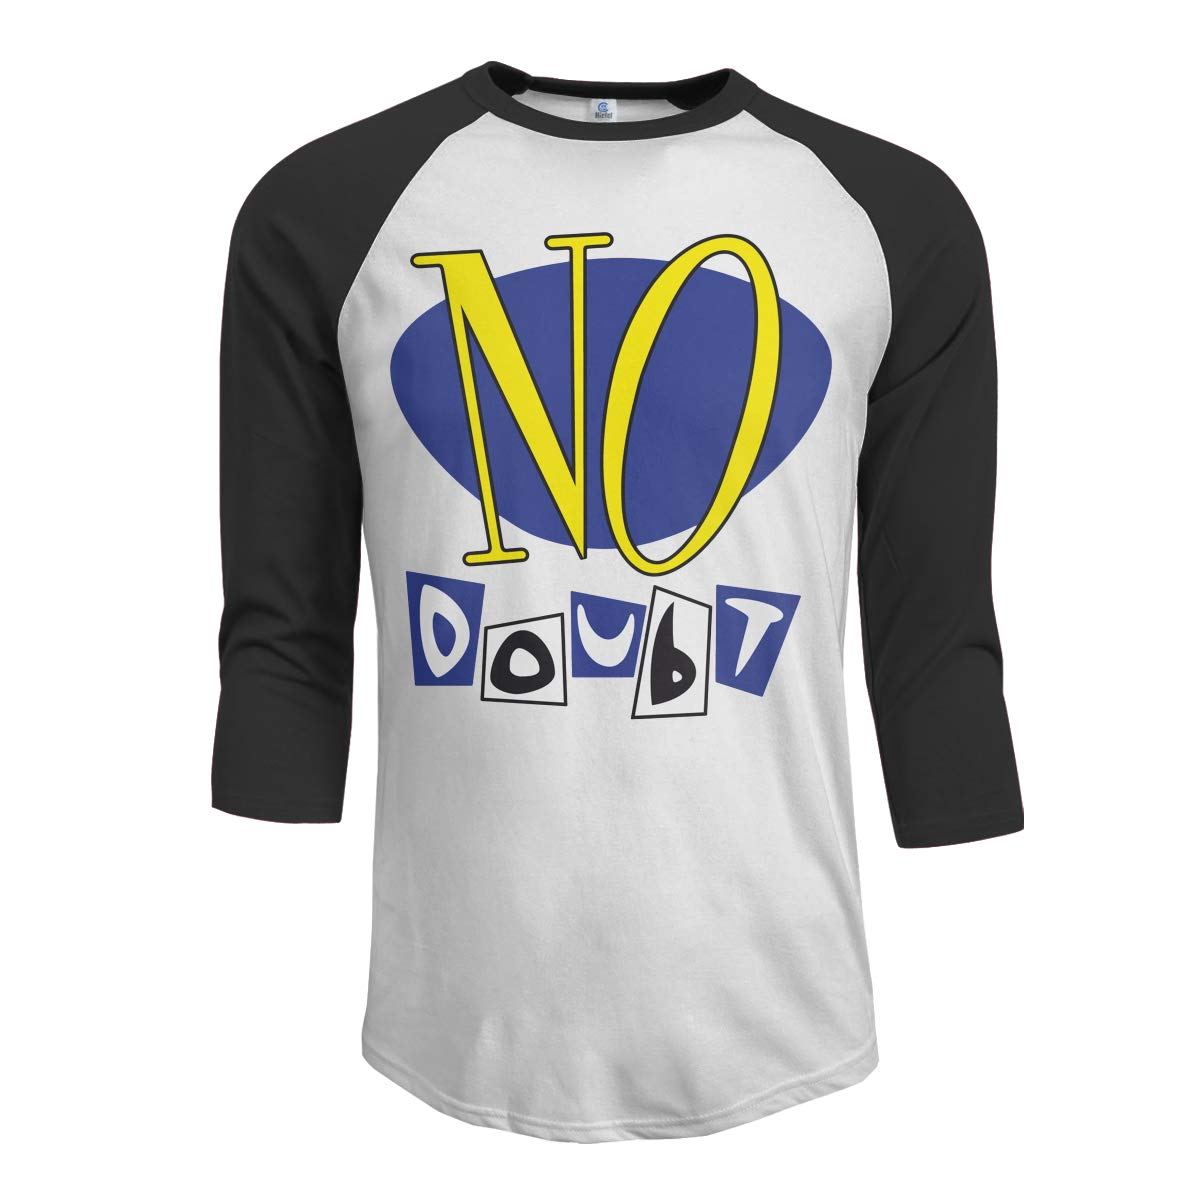 JeremiahR No Doubt Mens 3//4 Sleeve Raglan Baseball Tshirts Black